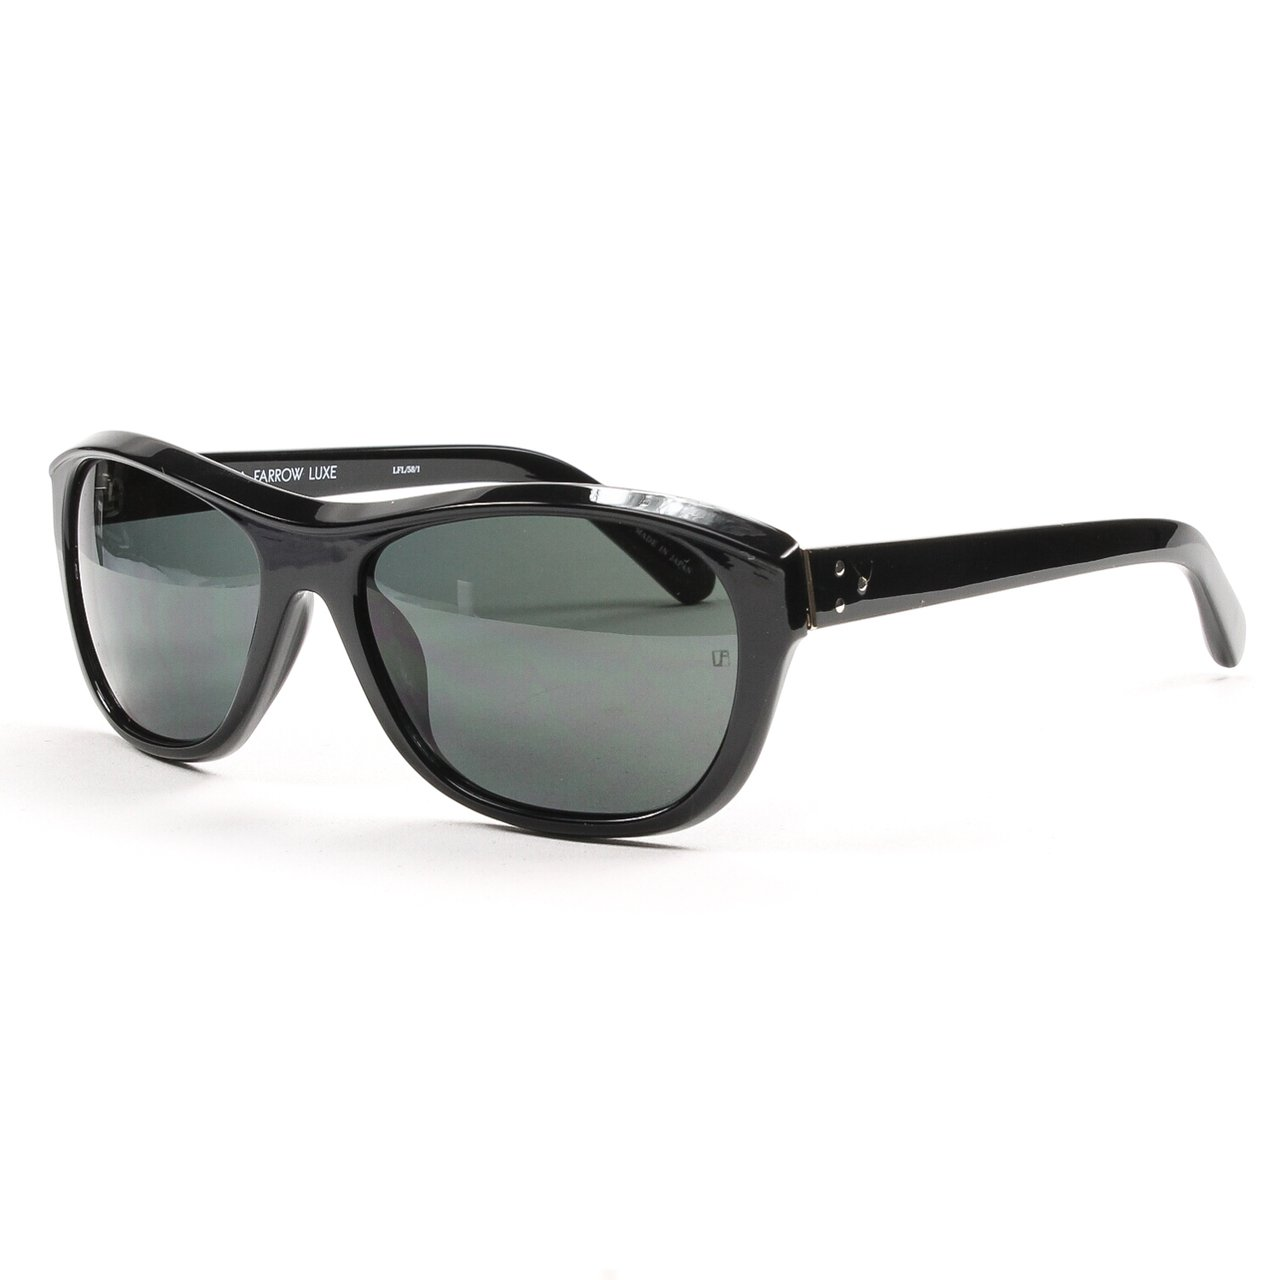 6df3cac59e1 Linda Farrow Luxe LFL 58 Sunglasses C1 Black Frame   Black Lenses  Linda  Farrow  Amazon.co.uk  Clothing